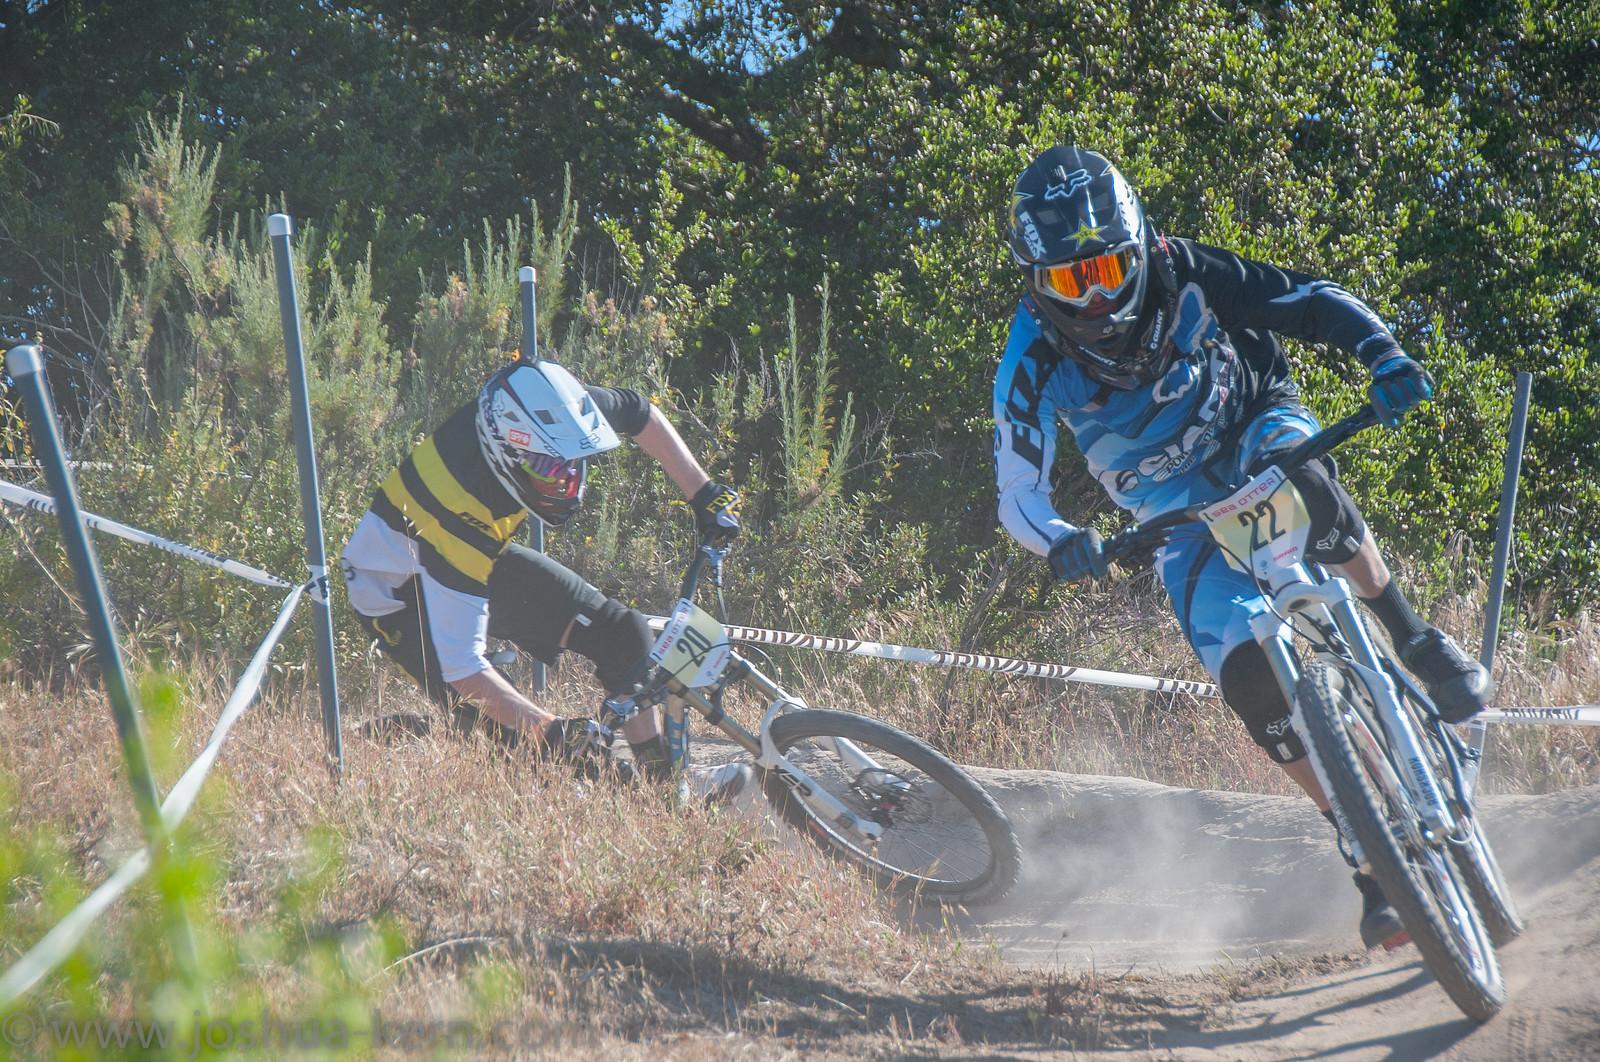 4-18-13DHPractice (9 of 17) - jkern620 - Mountain Biking Pictures - Vital MTB